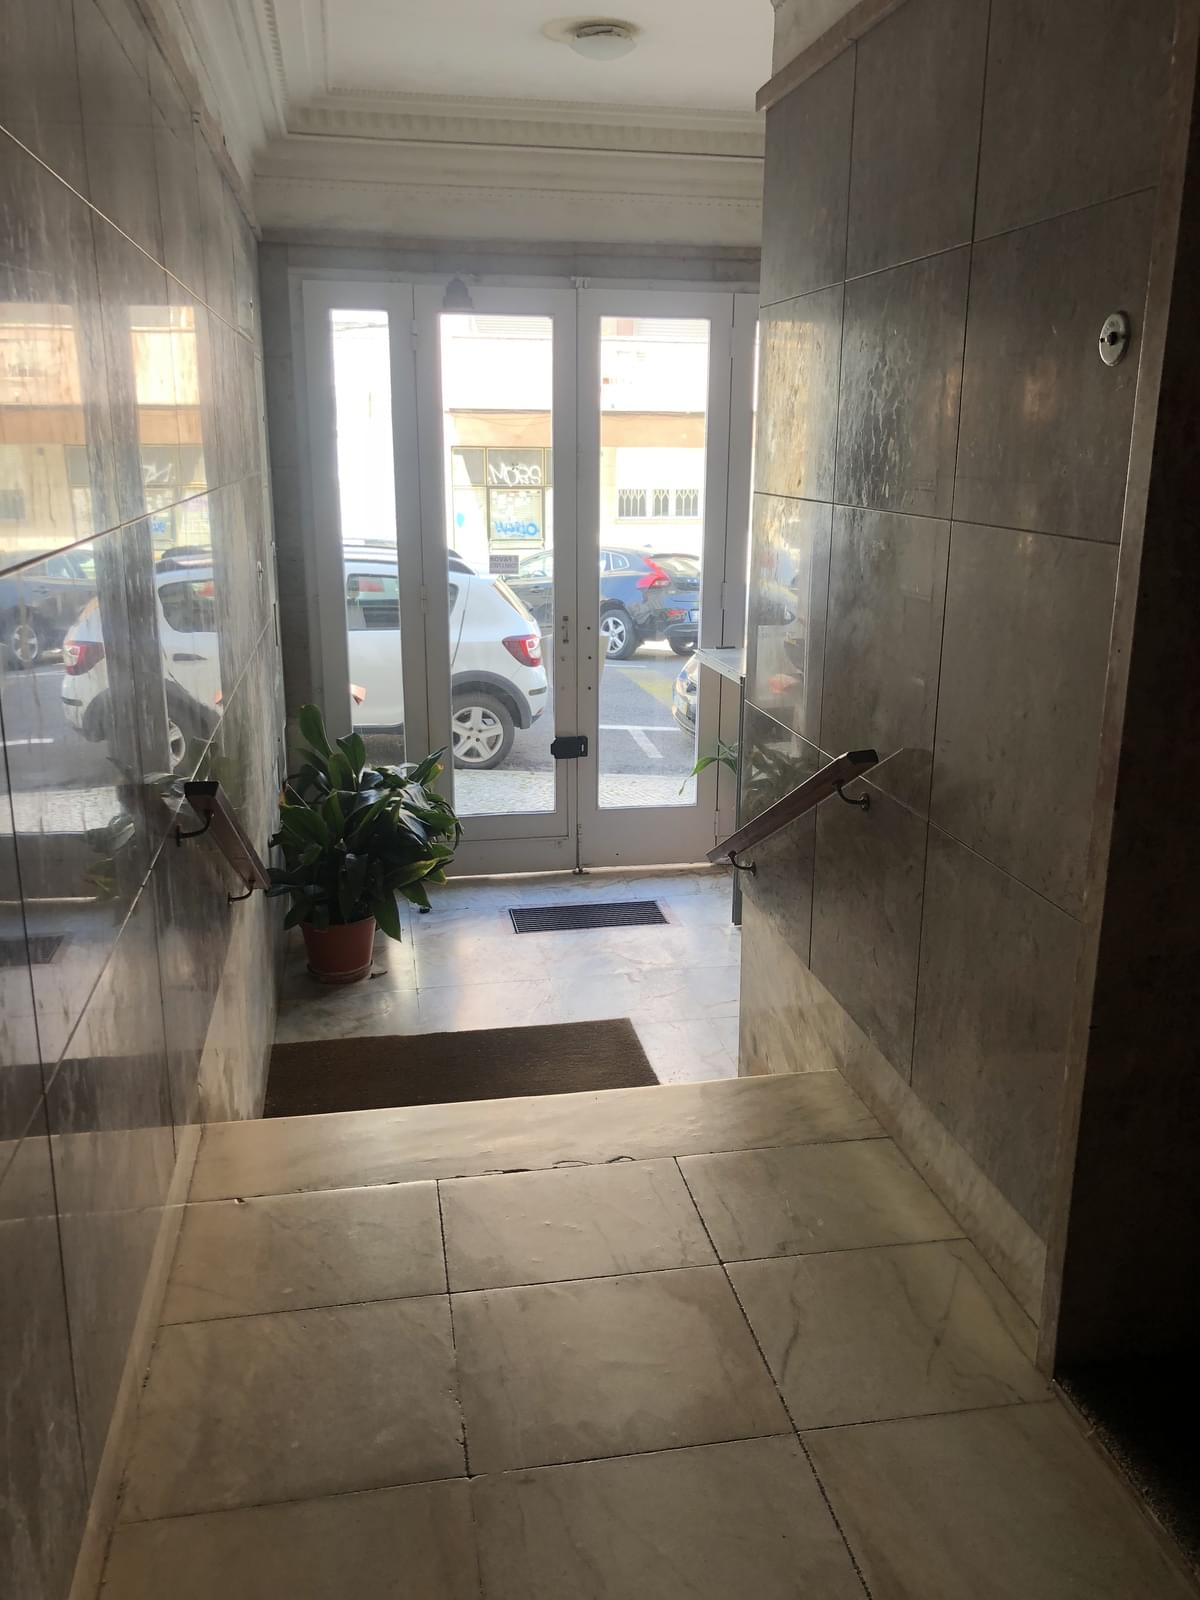 pf17234-apartamento-t3-lisboa-538d9348-9b80-4584-9e59-9c13ecb2d2e2